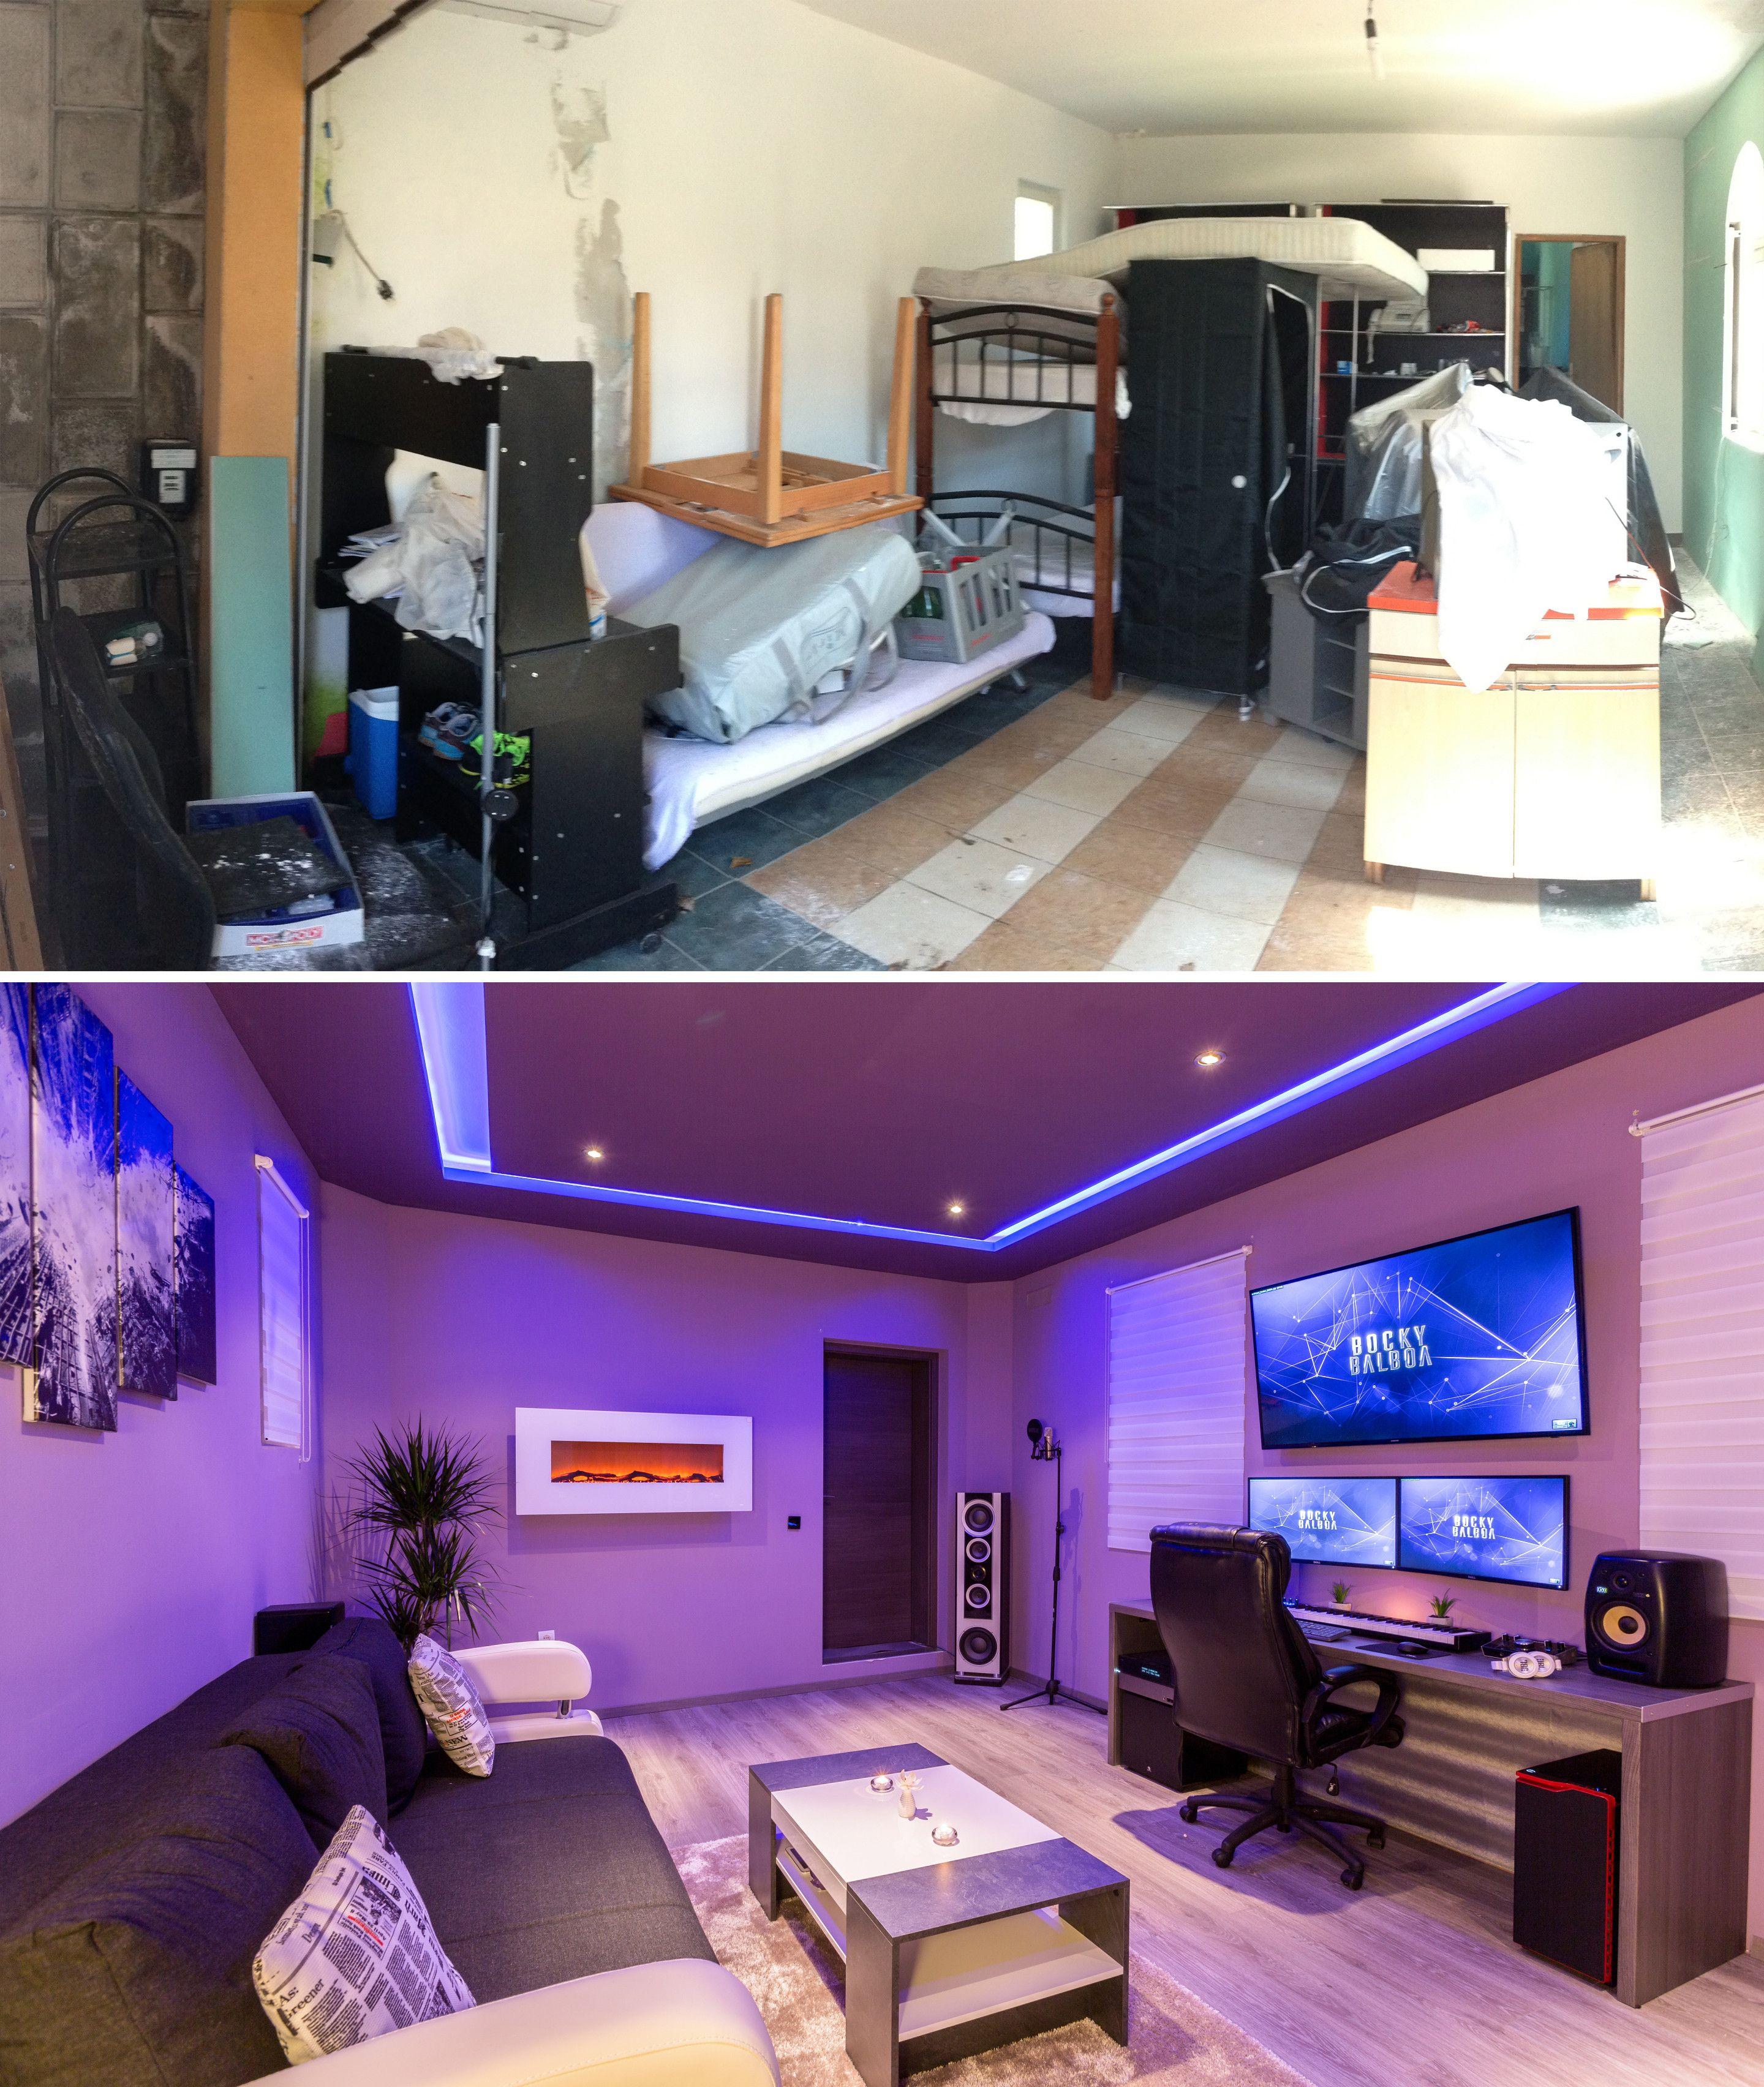 ve transformed unused garage into  music studio imgur also interiors rh sk pinterest